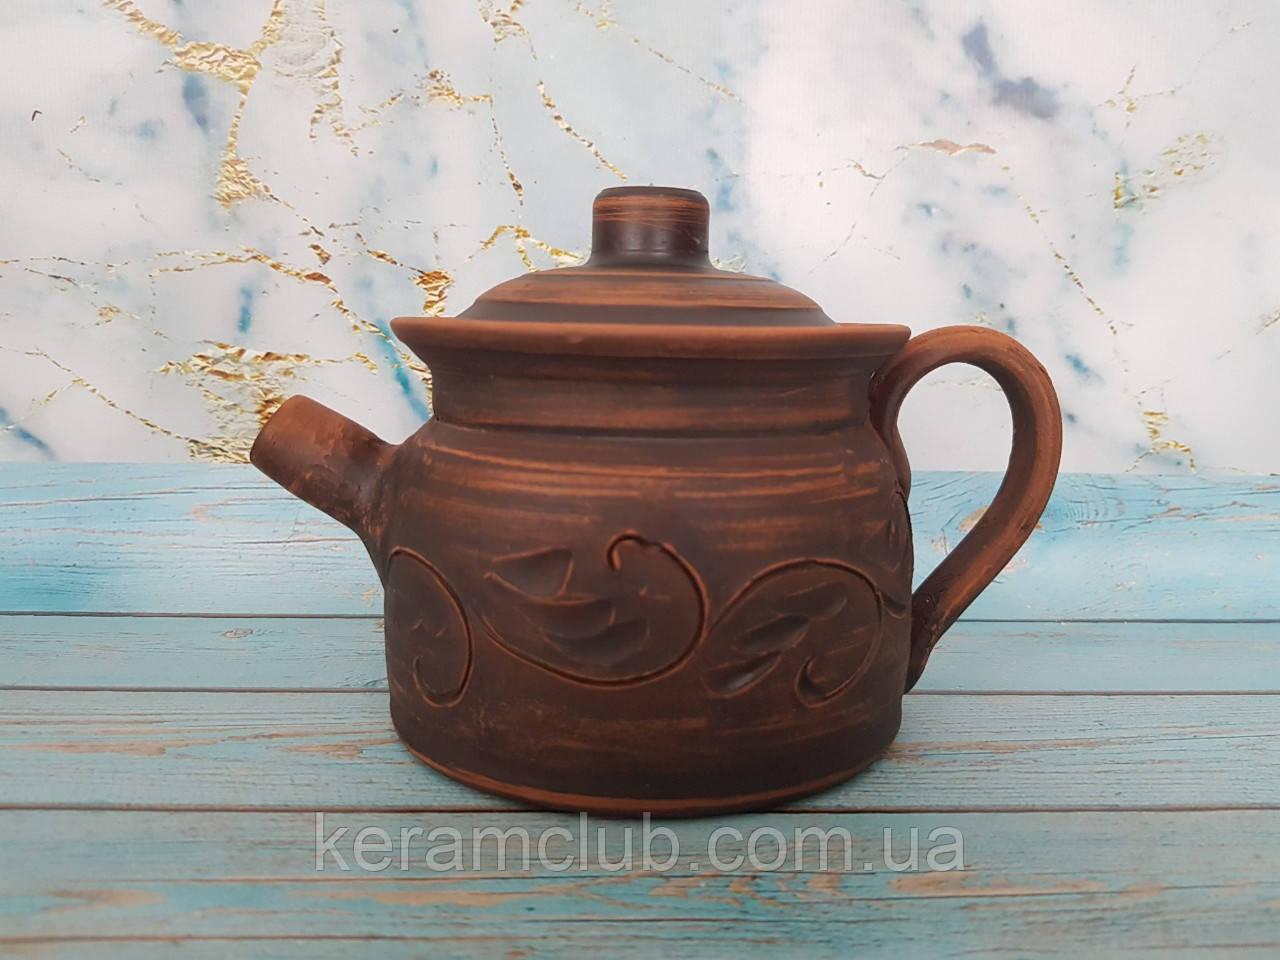 Глиняный заварочный чайник 500 мл